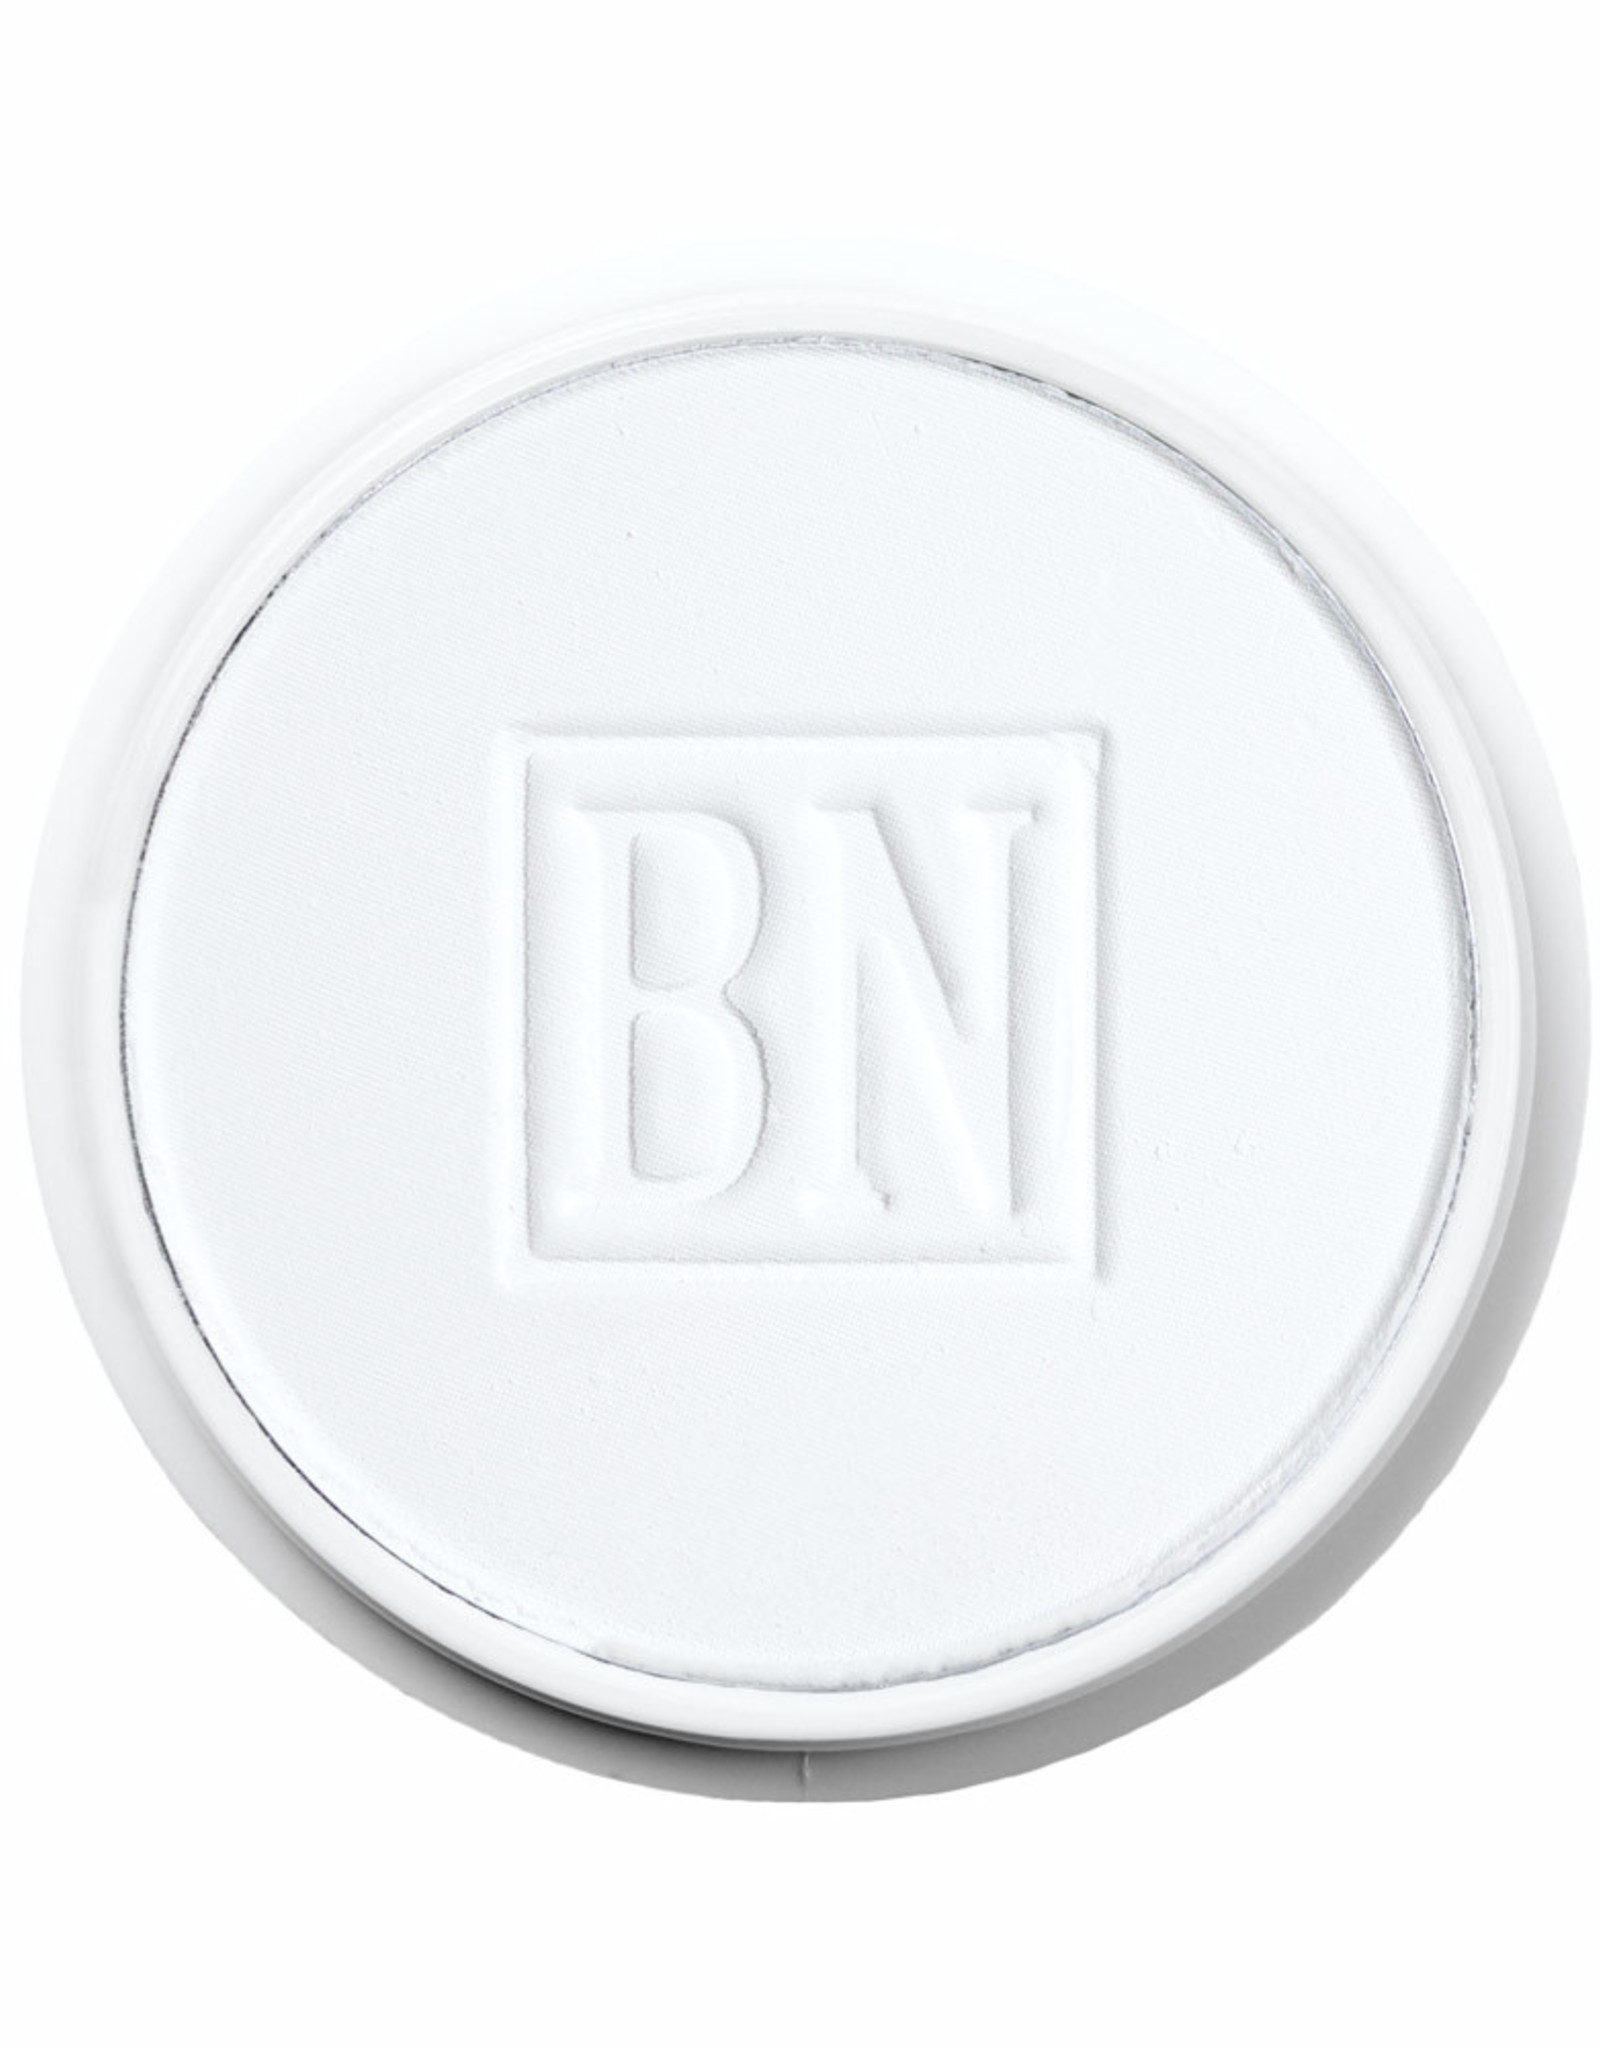 Ben Nye FOUNDATION-CAKE, WHITE, 1 OZ